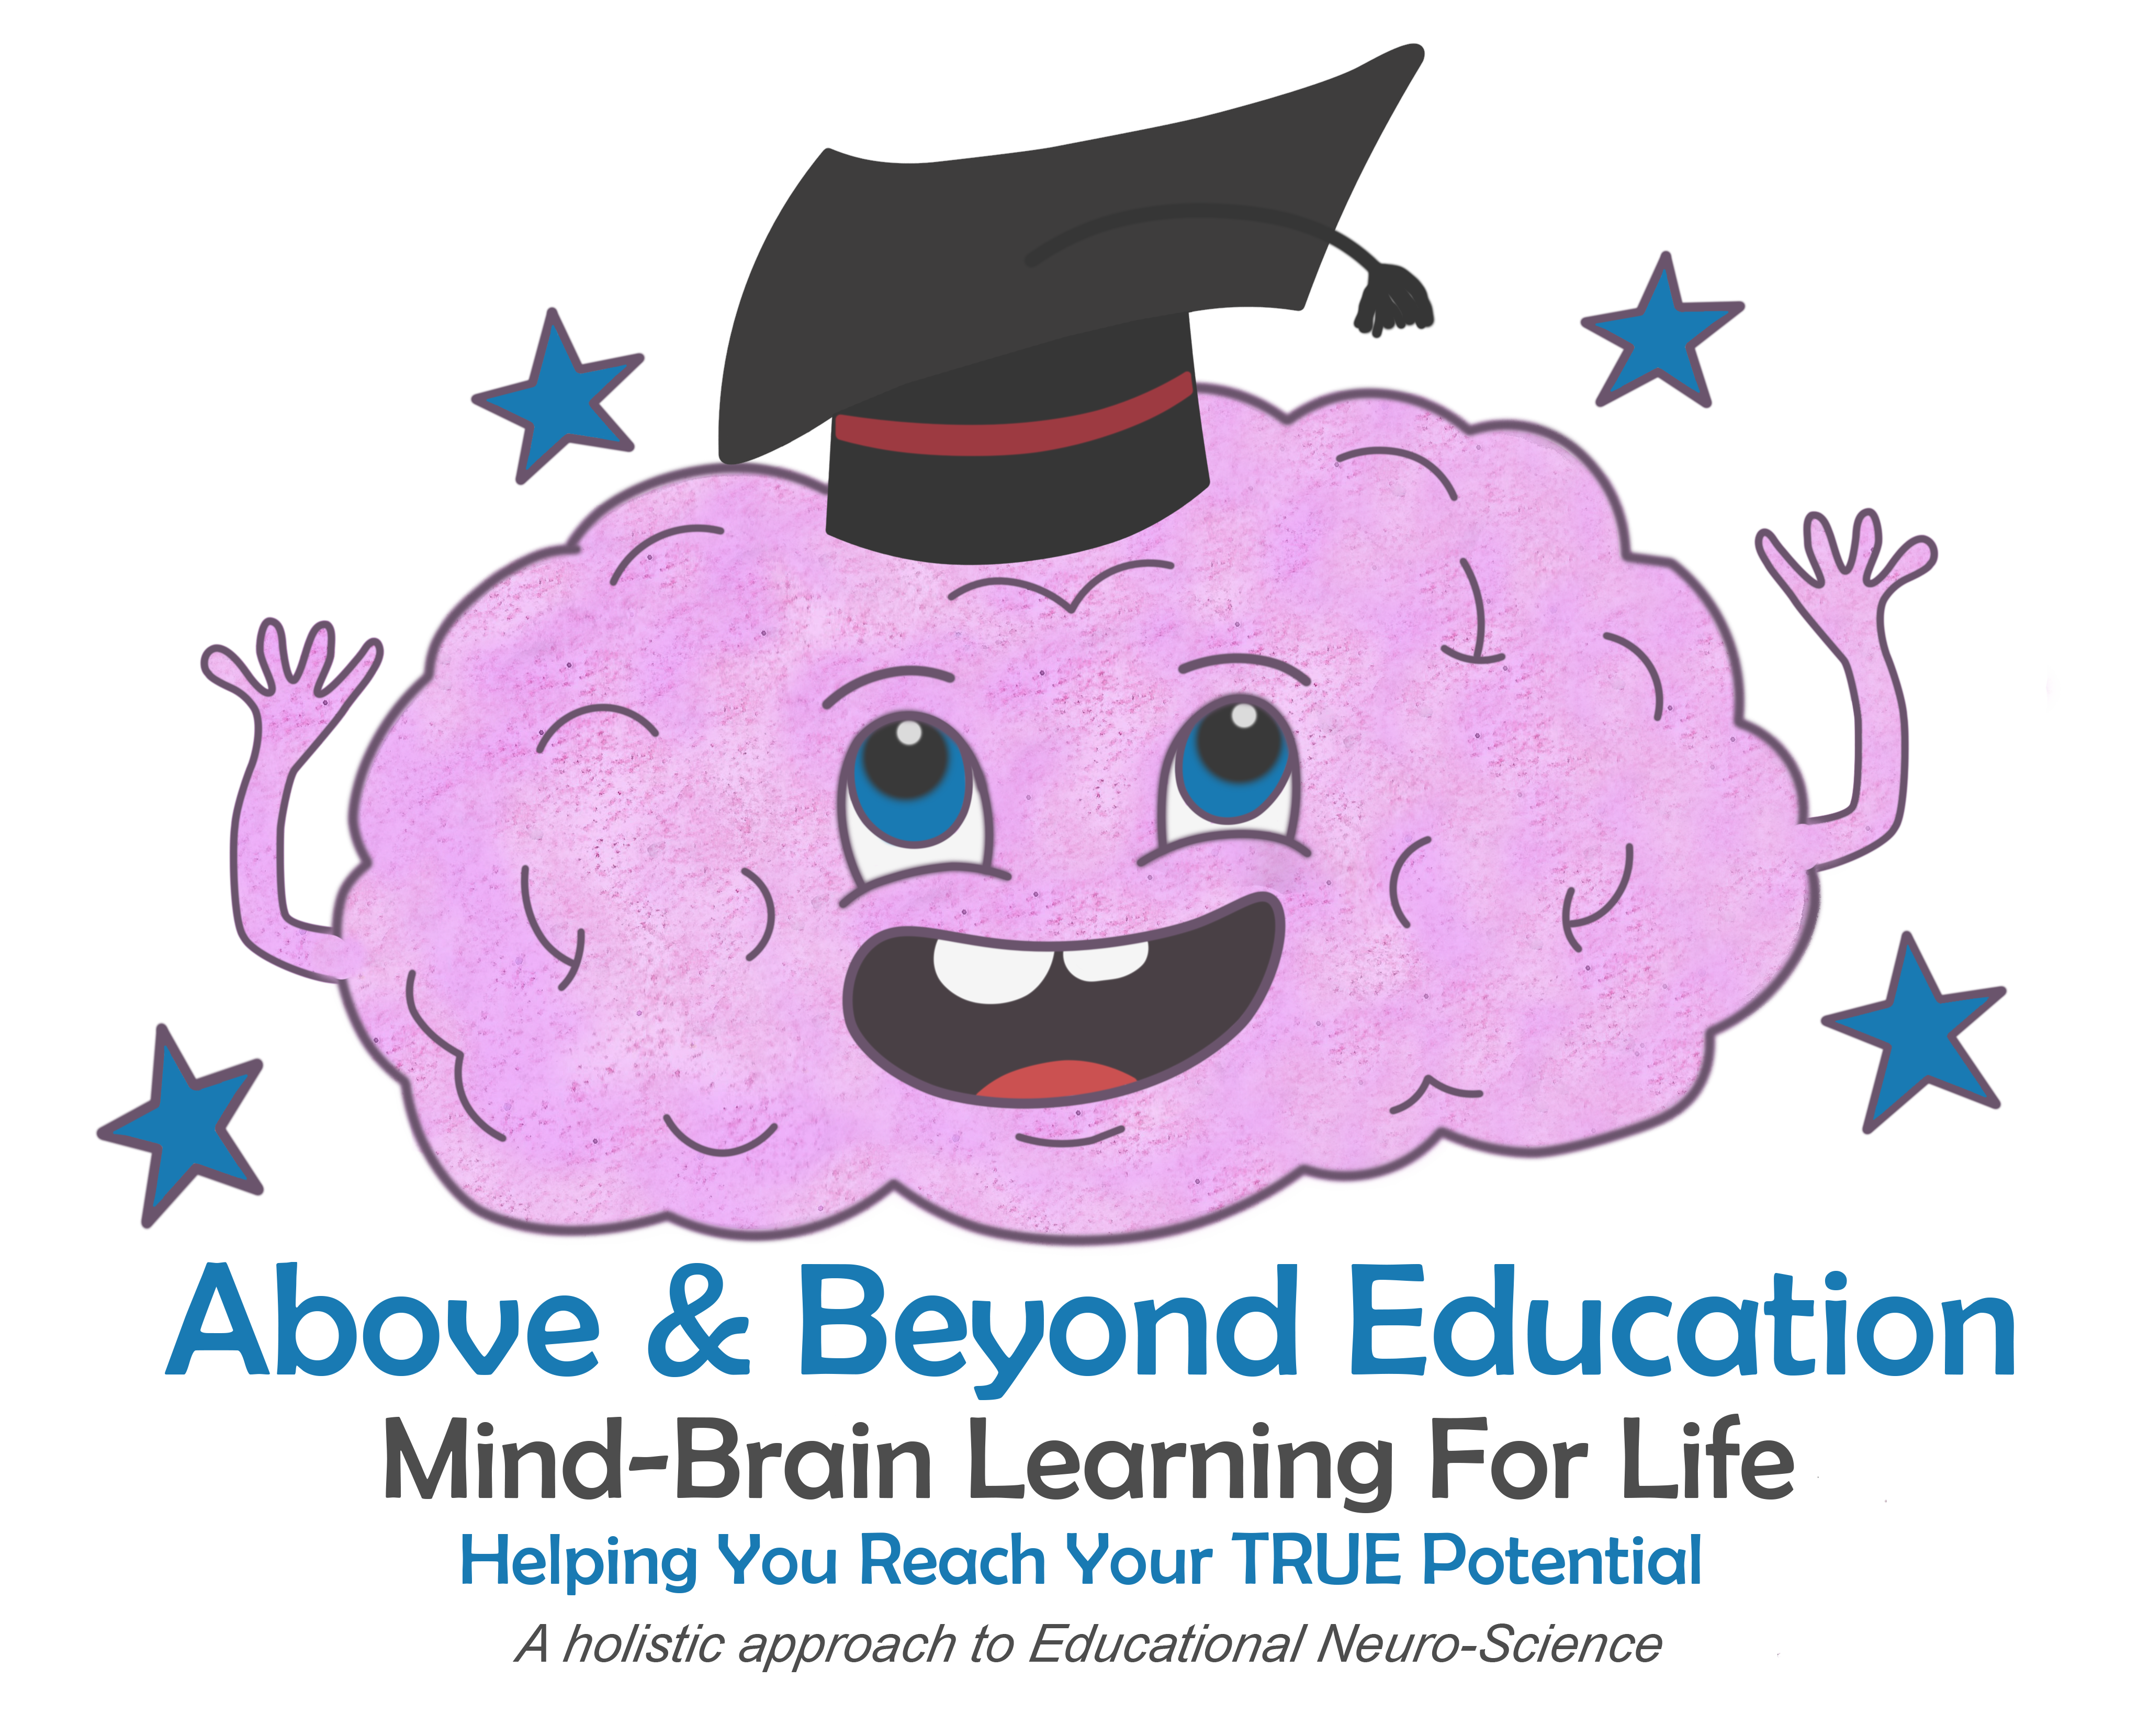 Above & Beyond Education Logo